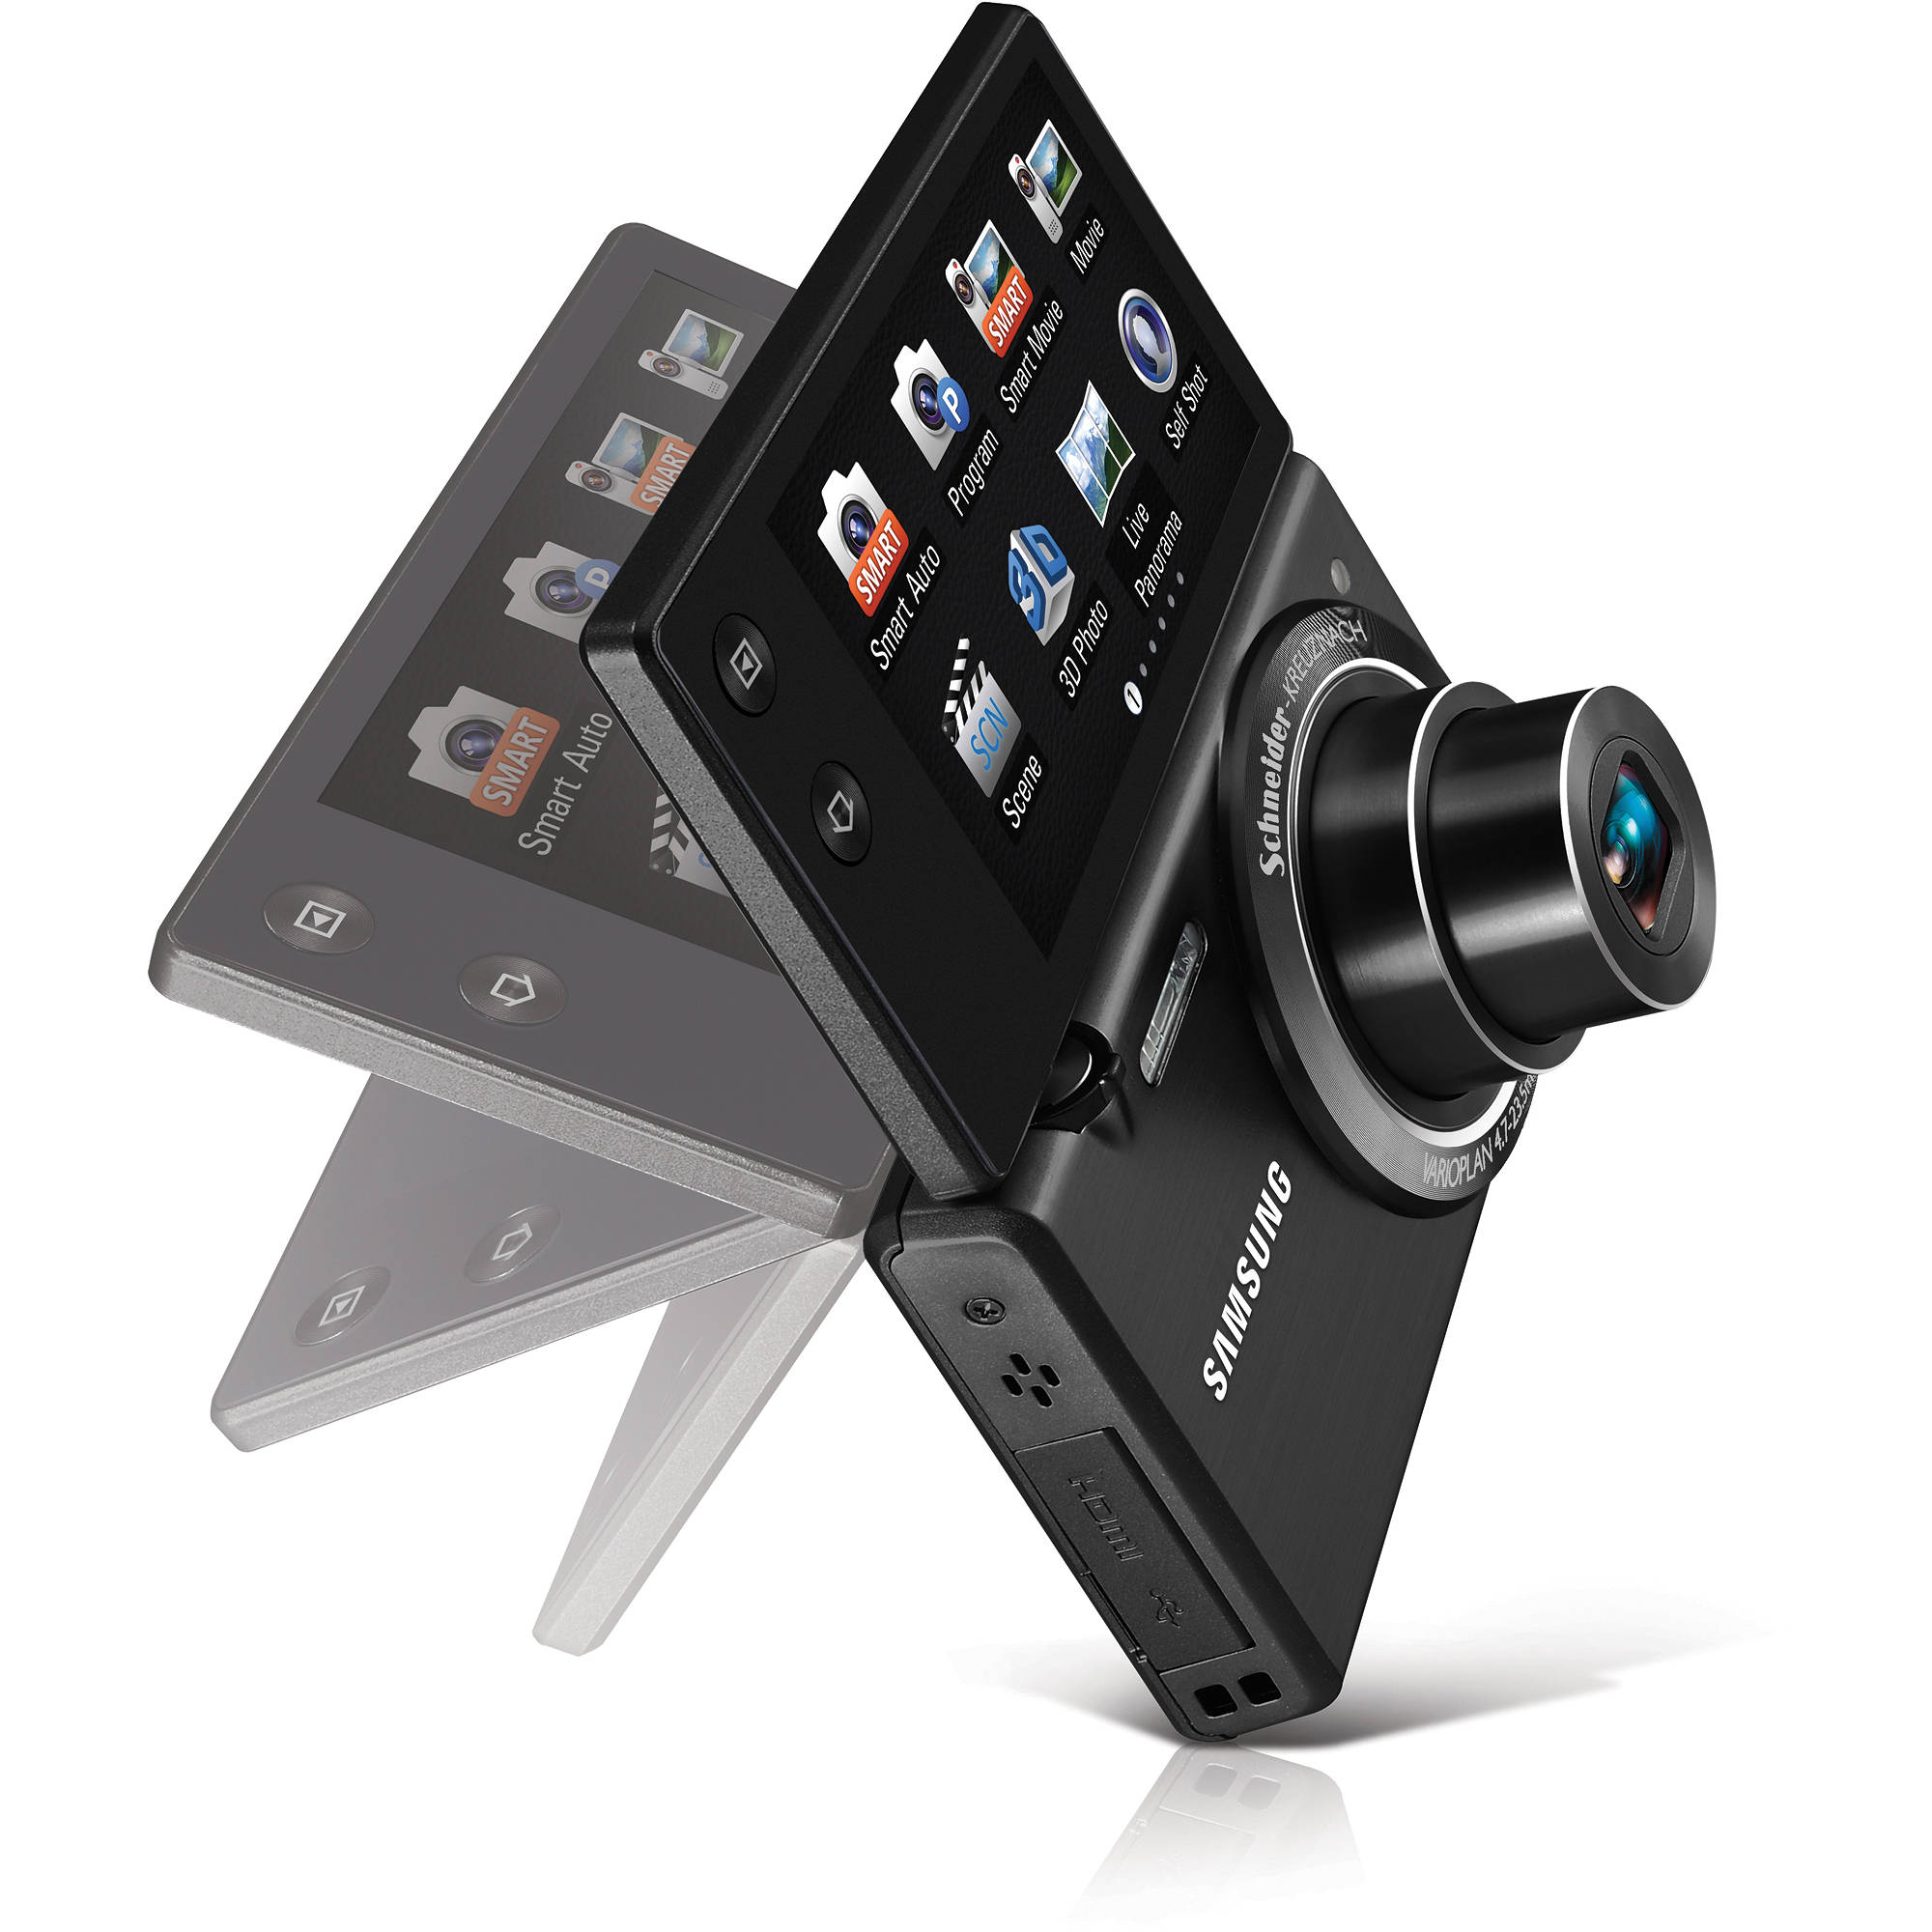 Samsung MV800 Digital Camera Linux